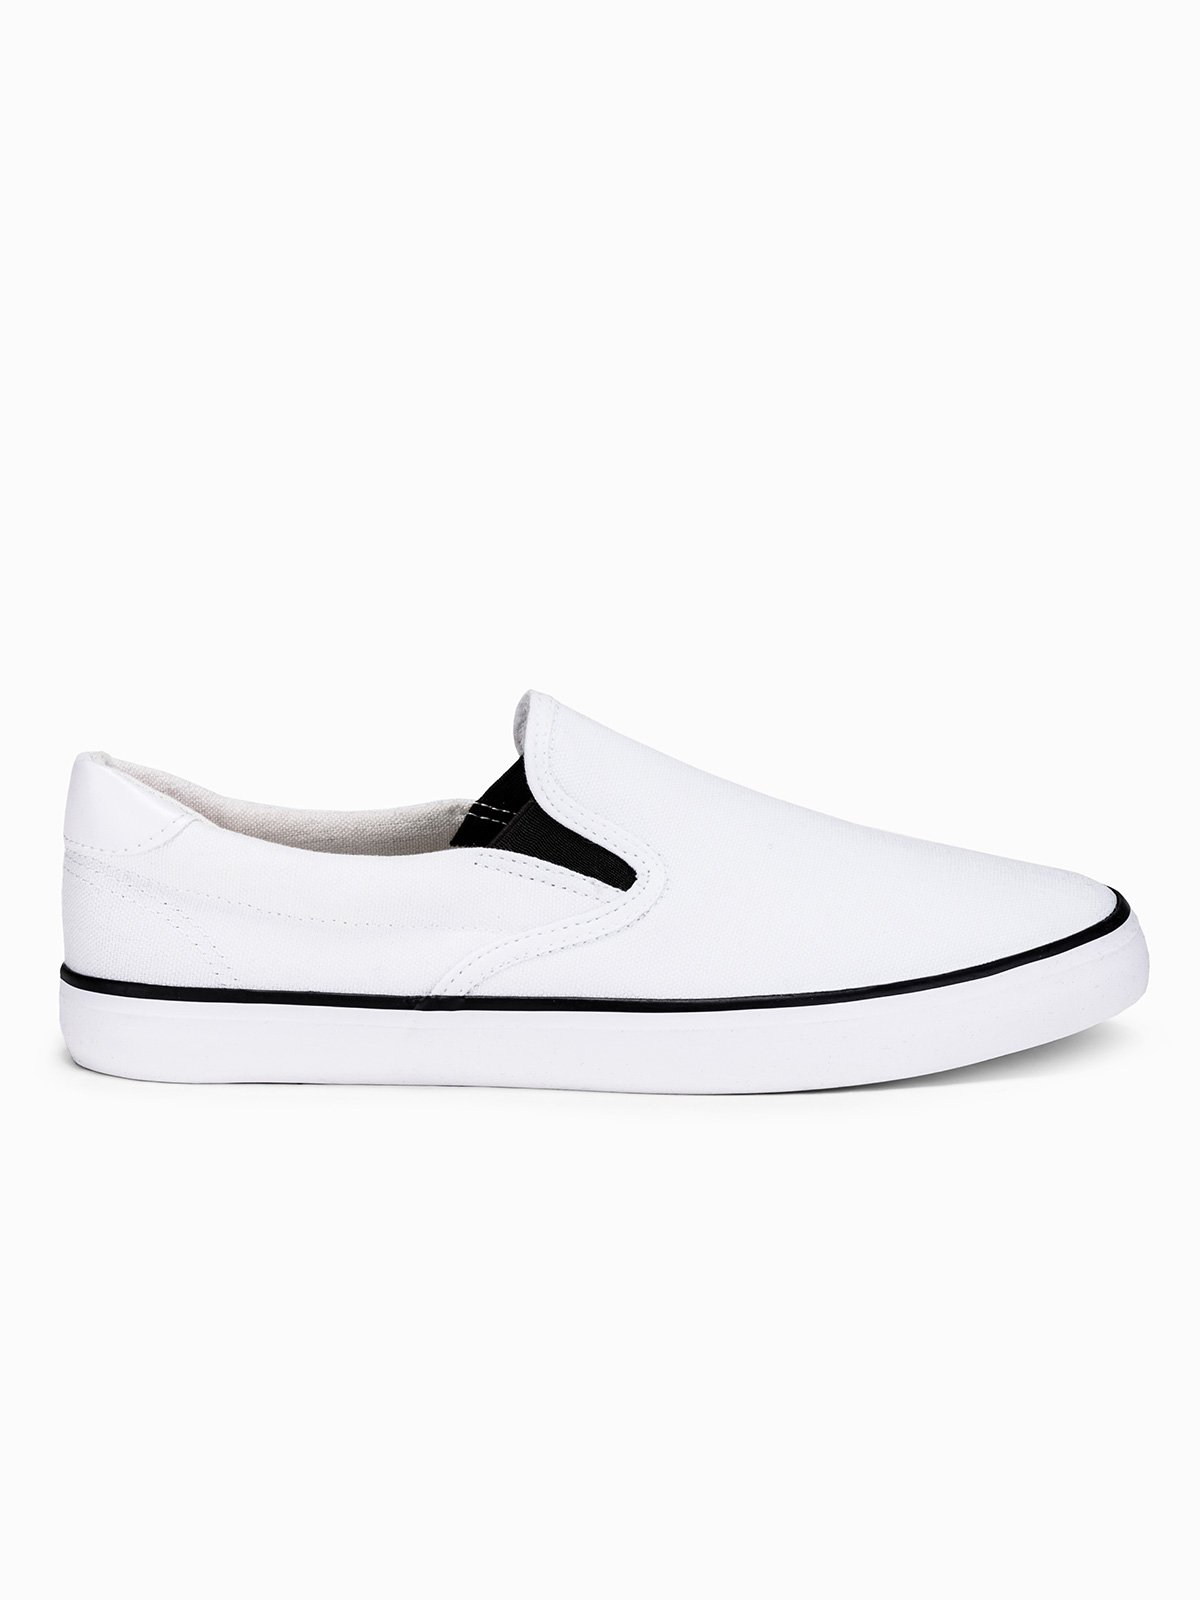 Buty męskie slip on T301 białe | MODONE wholesale